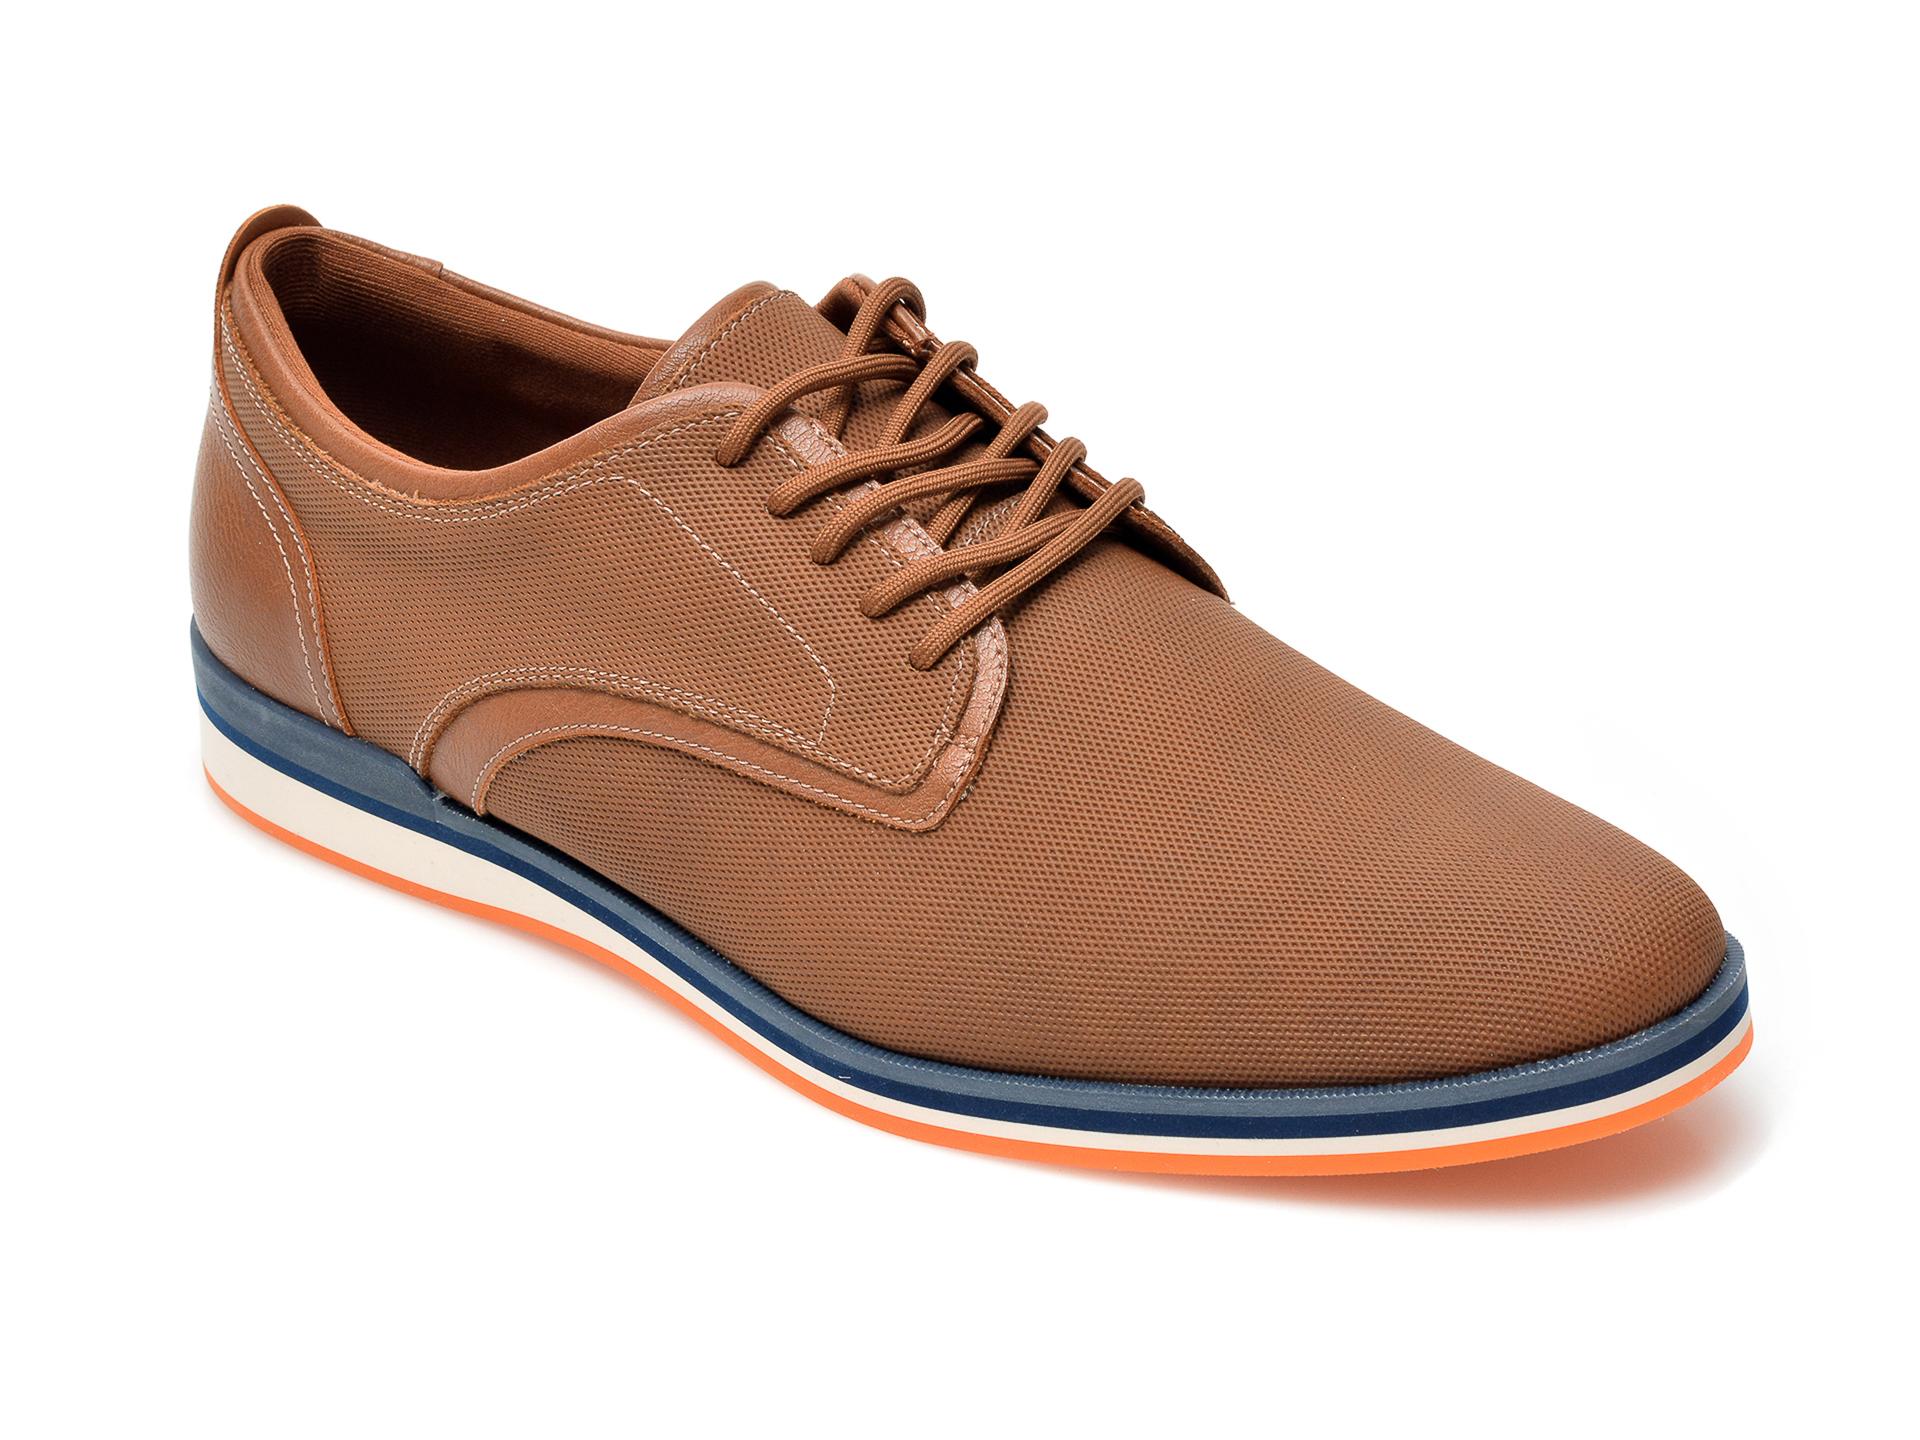 Pantofi ALDO maro, Eowoalian220, din piele ecologica imagine otter.ro 2021